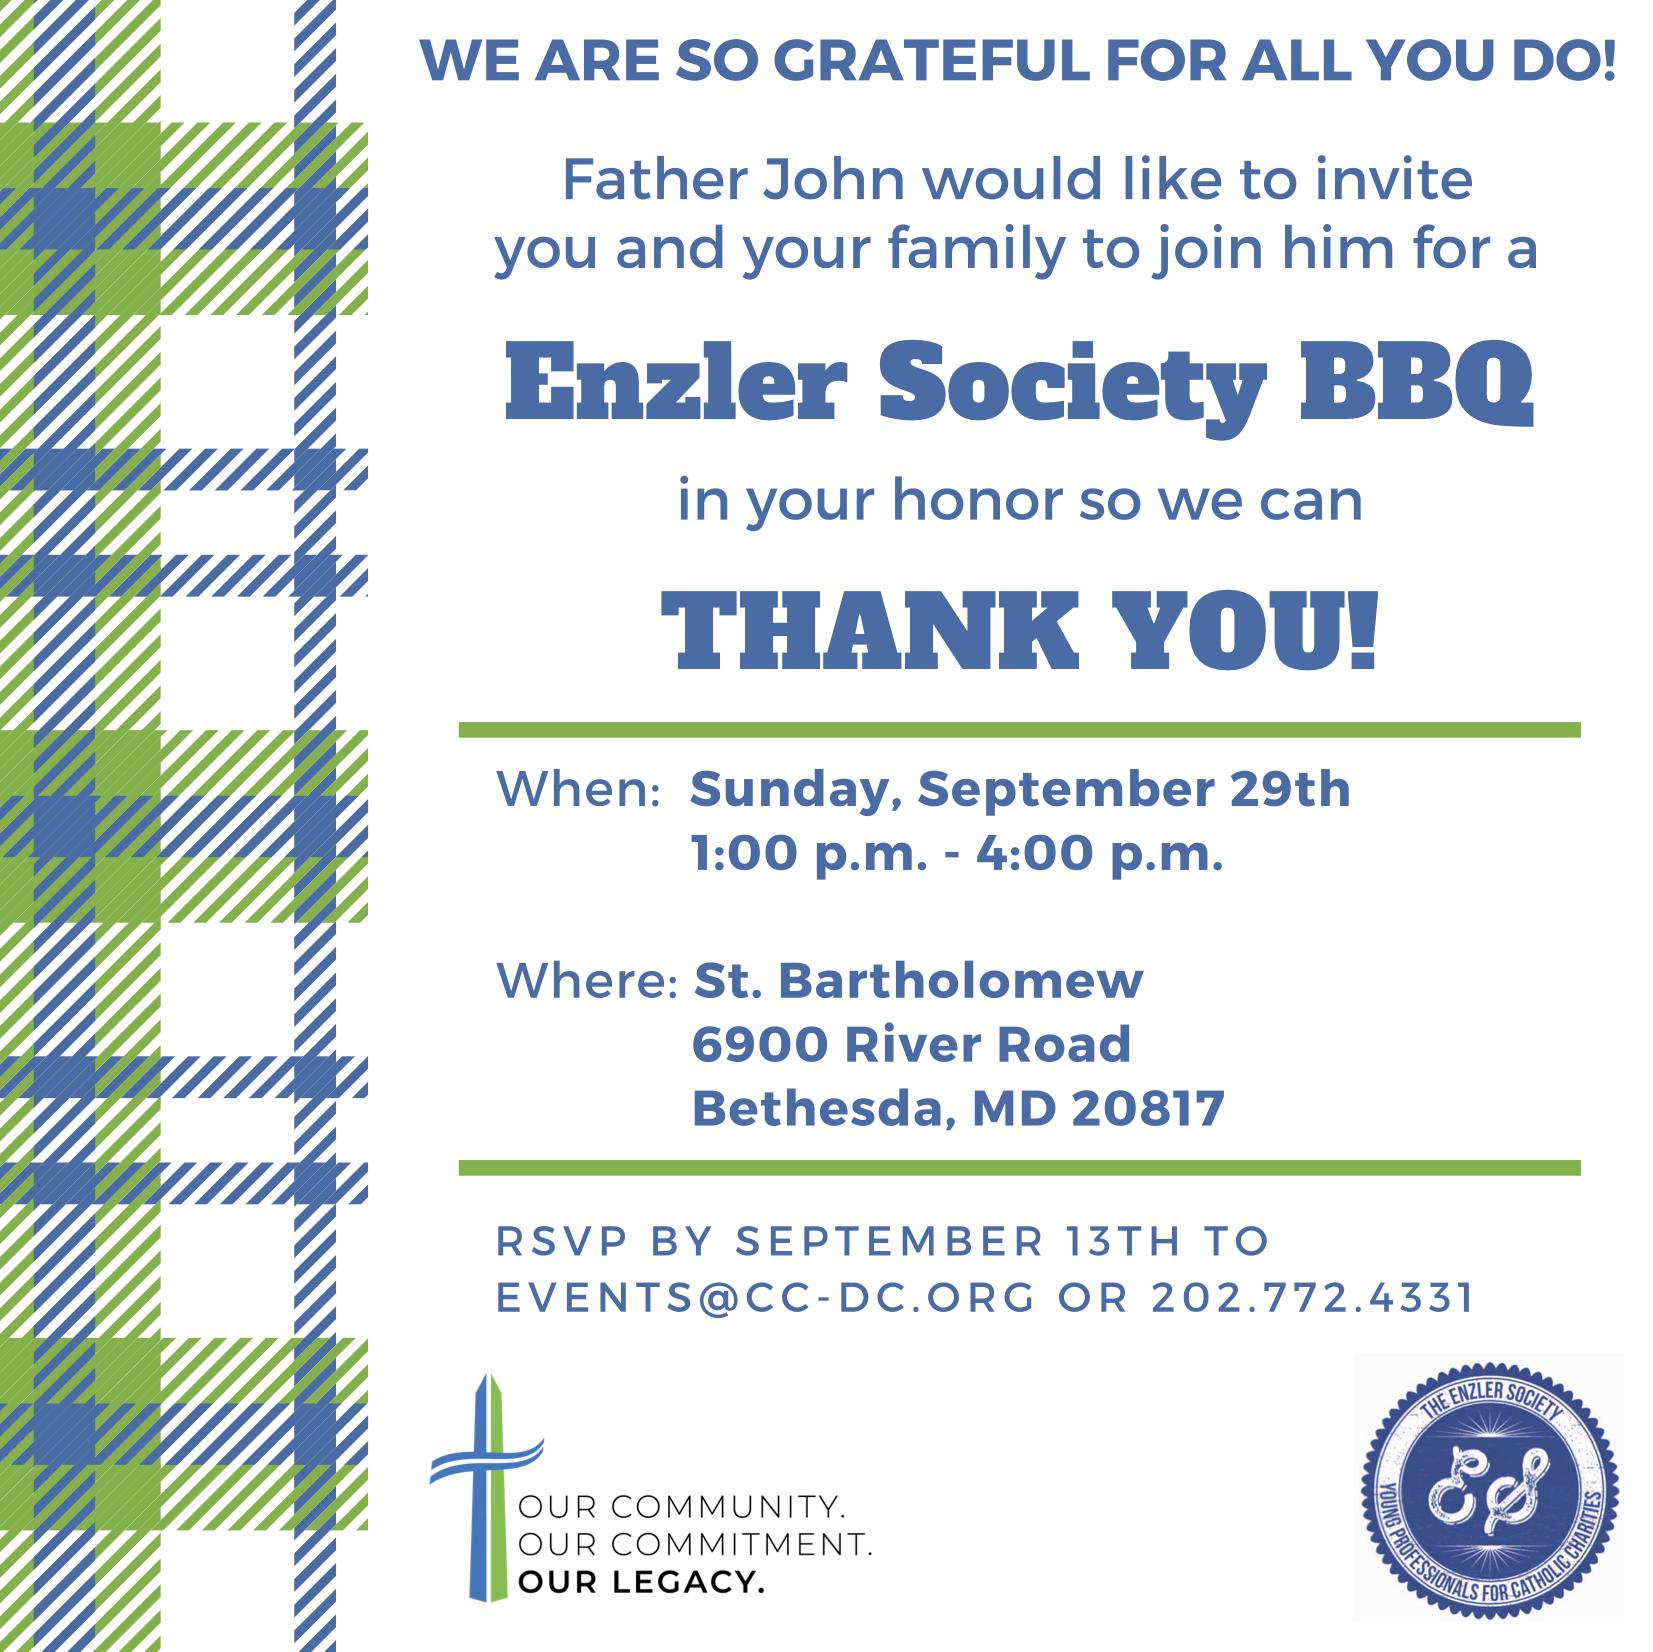 Enzler Society BBQ @ St. Bartholomew | Bethesda | Maryland | United States